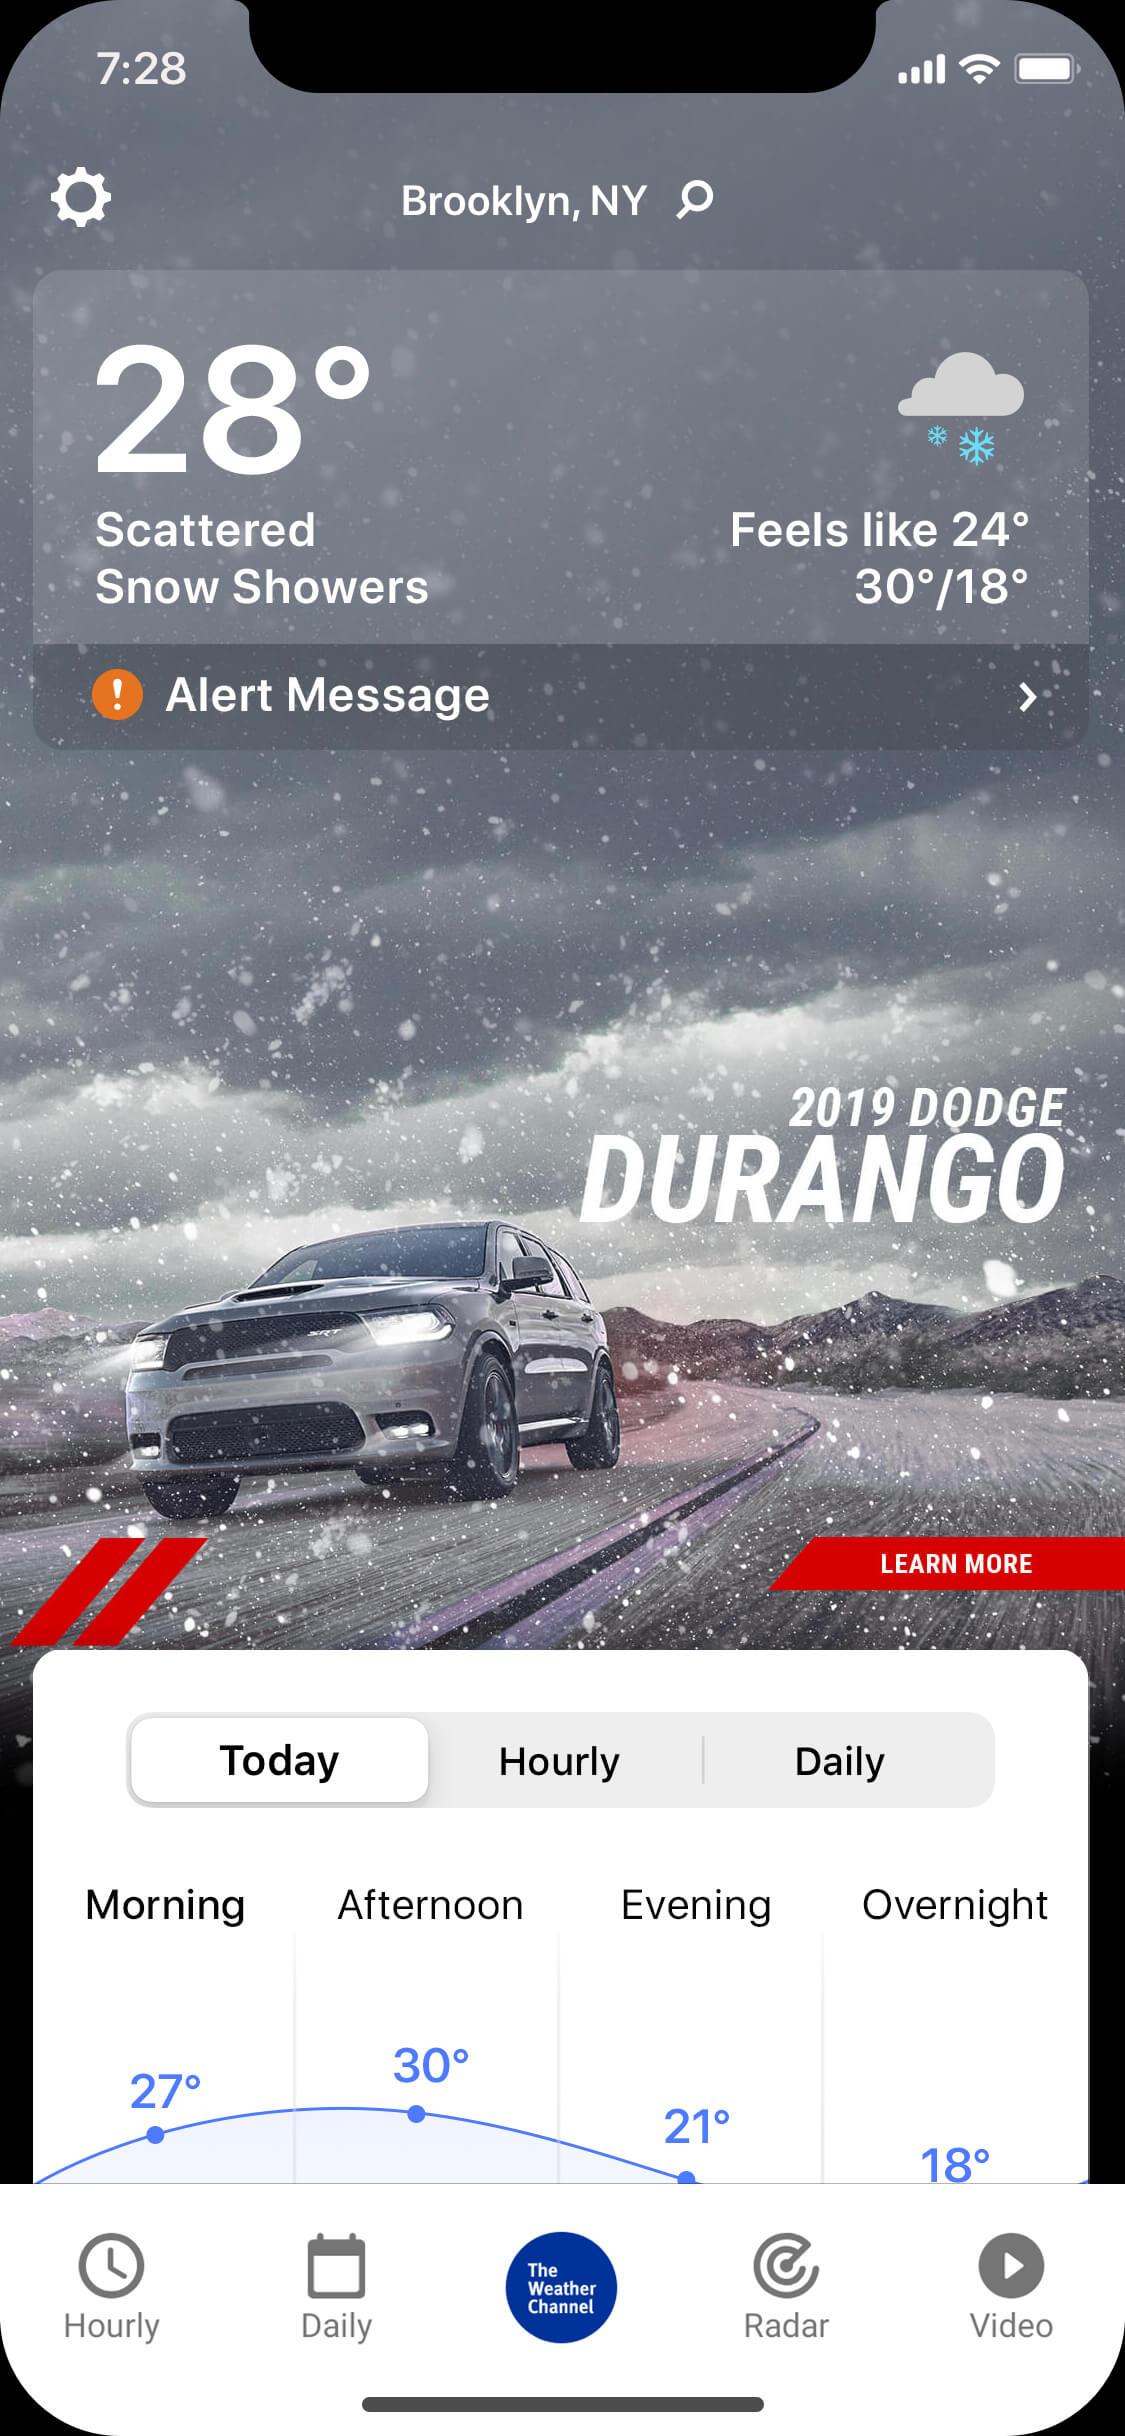 Durango_wintry_day